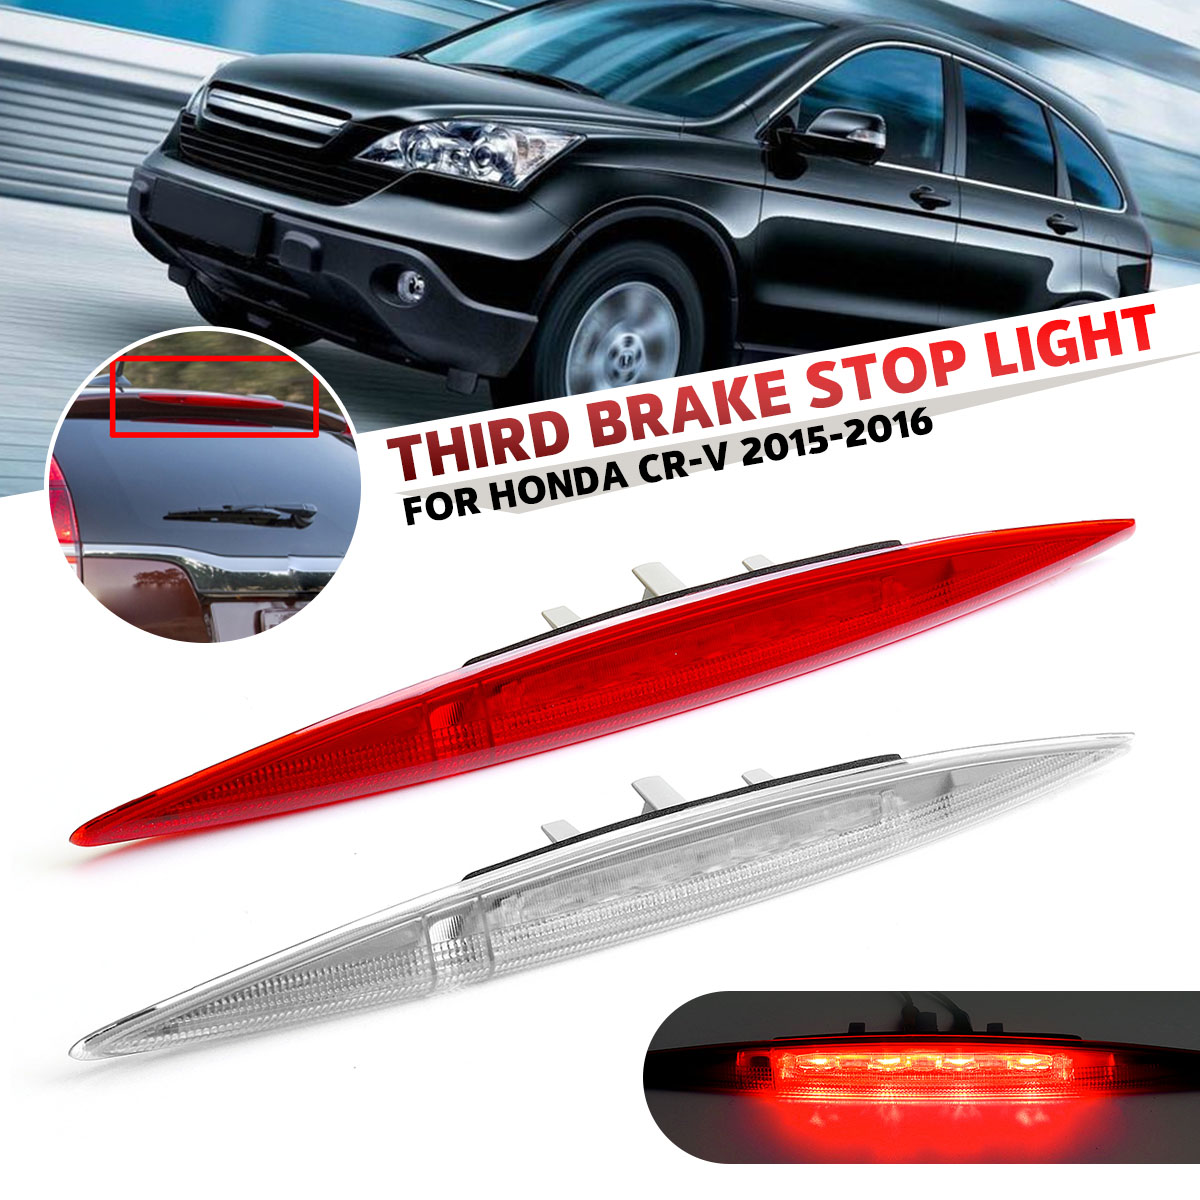 For Honda CR-V 2012-2014 Rear High Mount Warning 3rd Third Brake Light